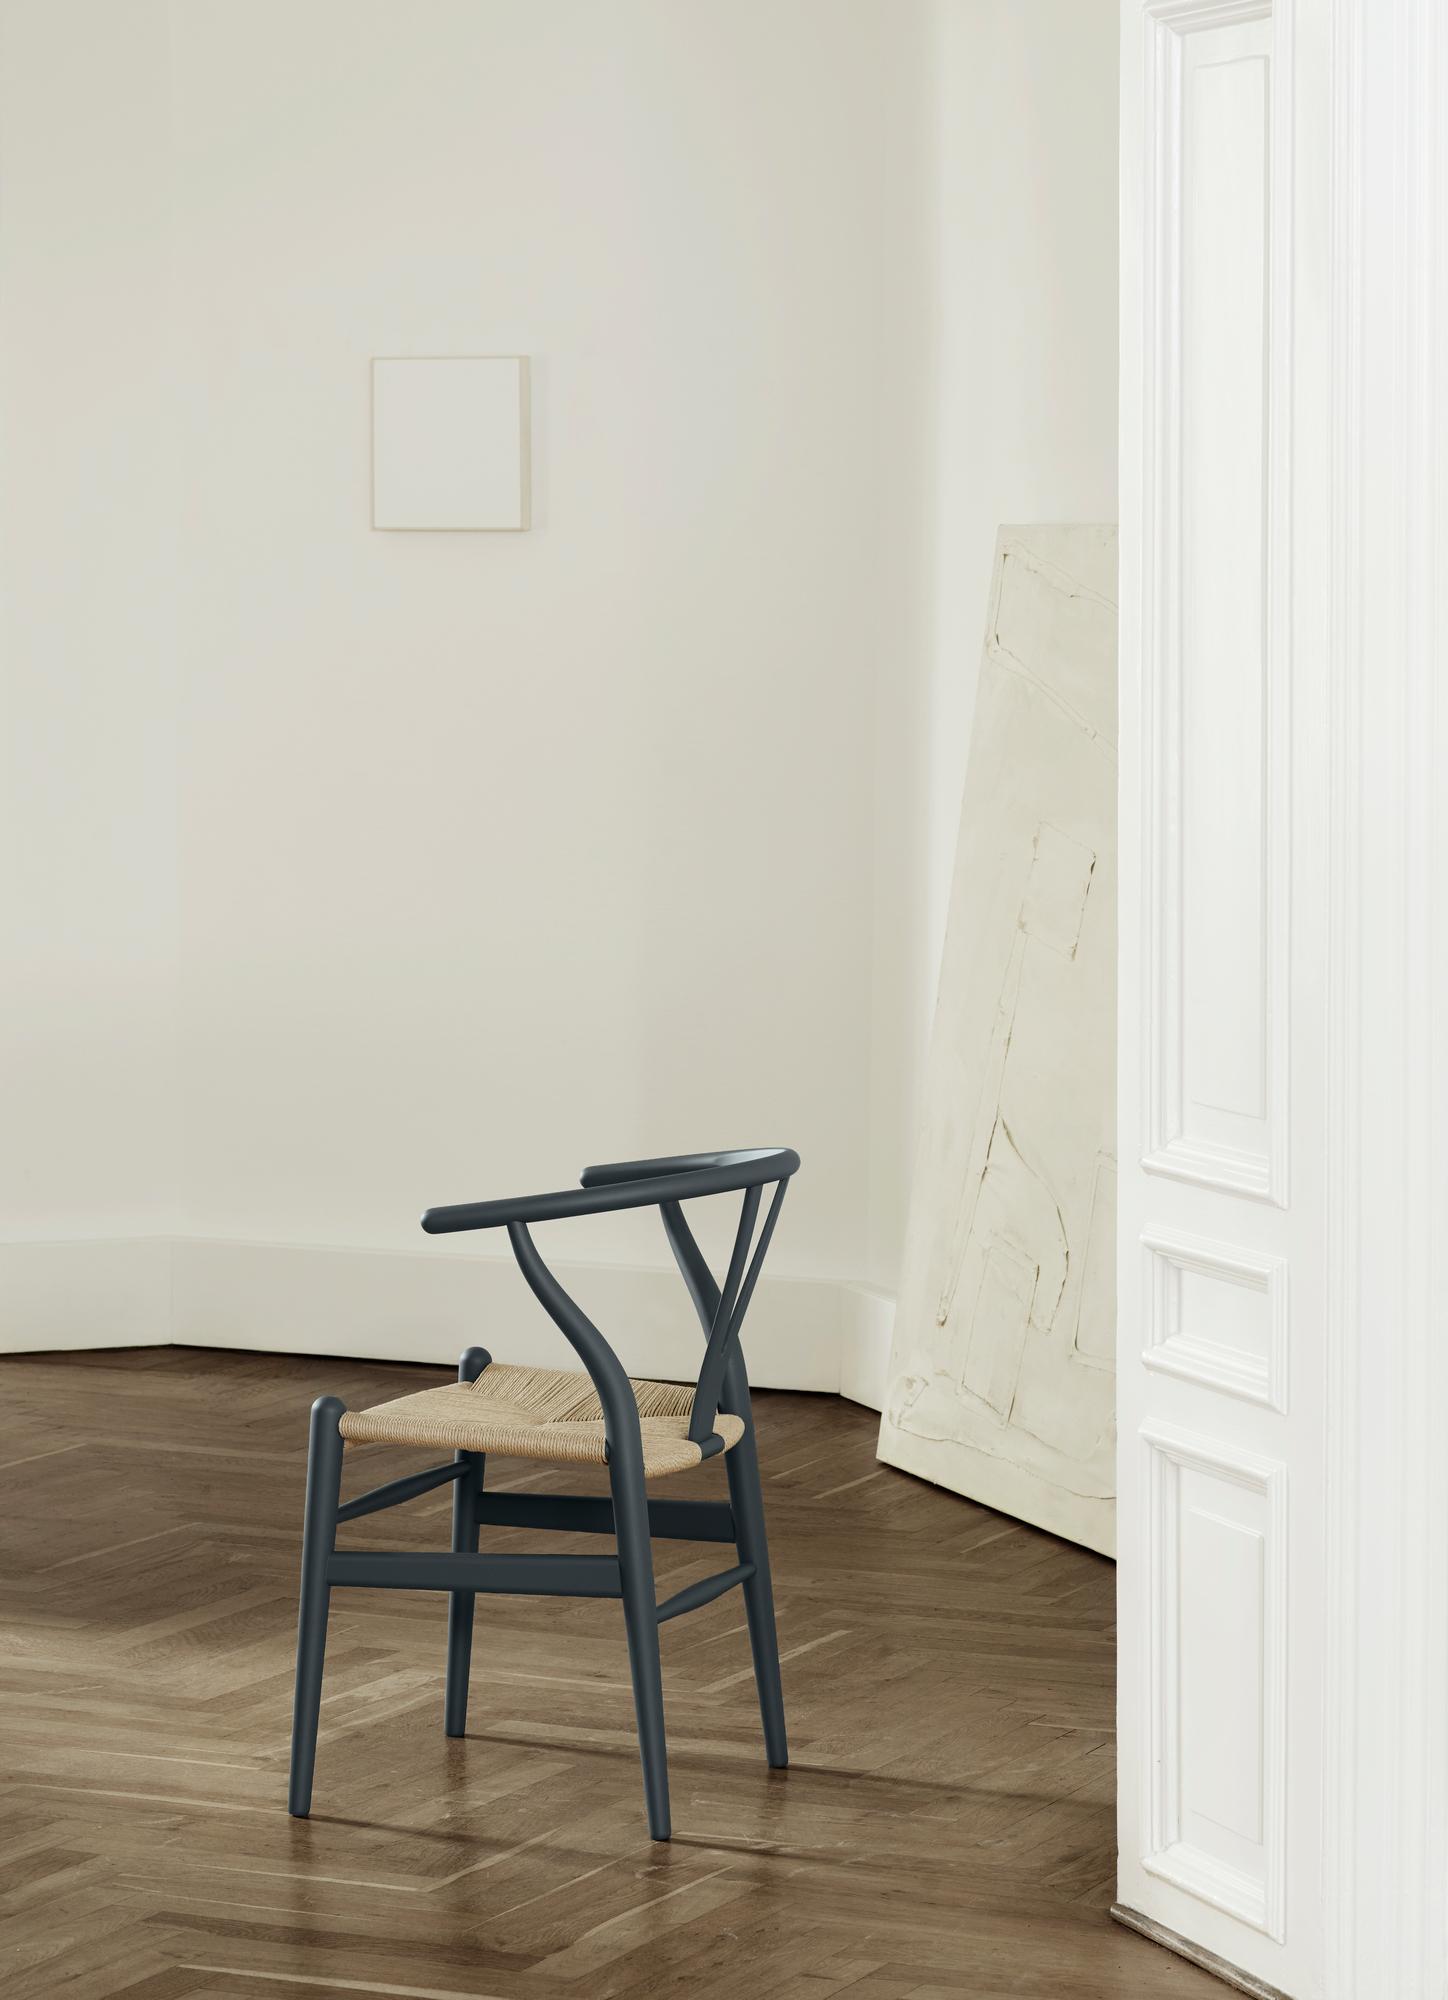 CH24SOFT Wishbone Chair / Y-Chair Carl Hansen& SønLIMITED EDITION green